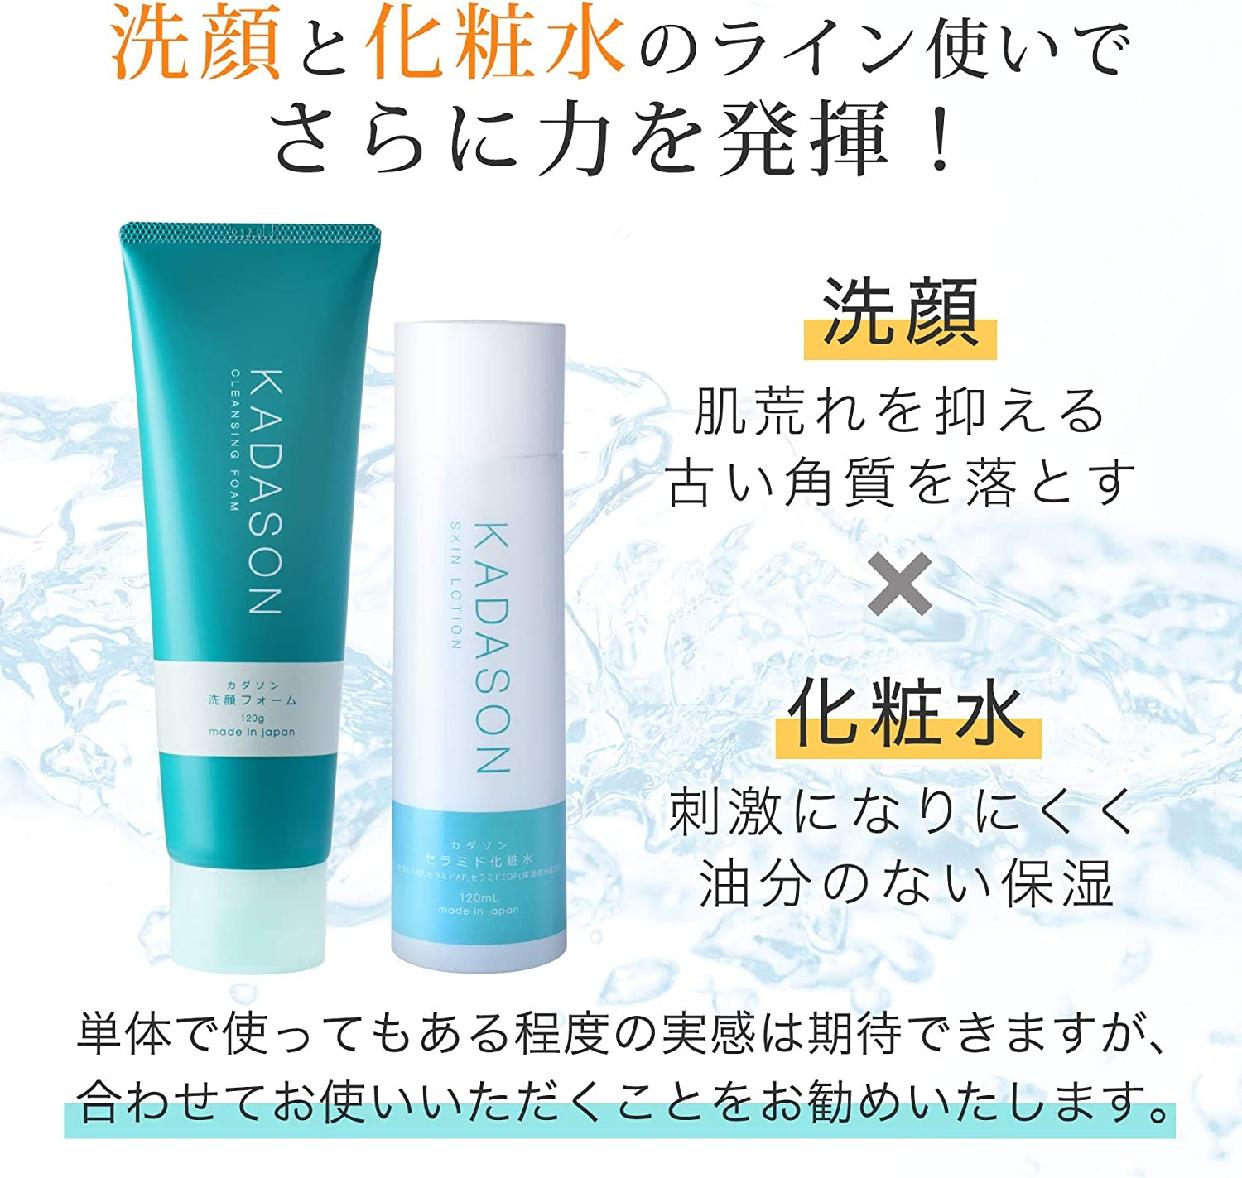 KADASON(カダソン) スキンケア 洗顔フォームの商品画像4